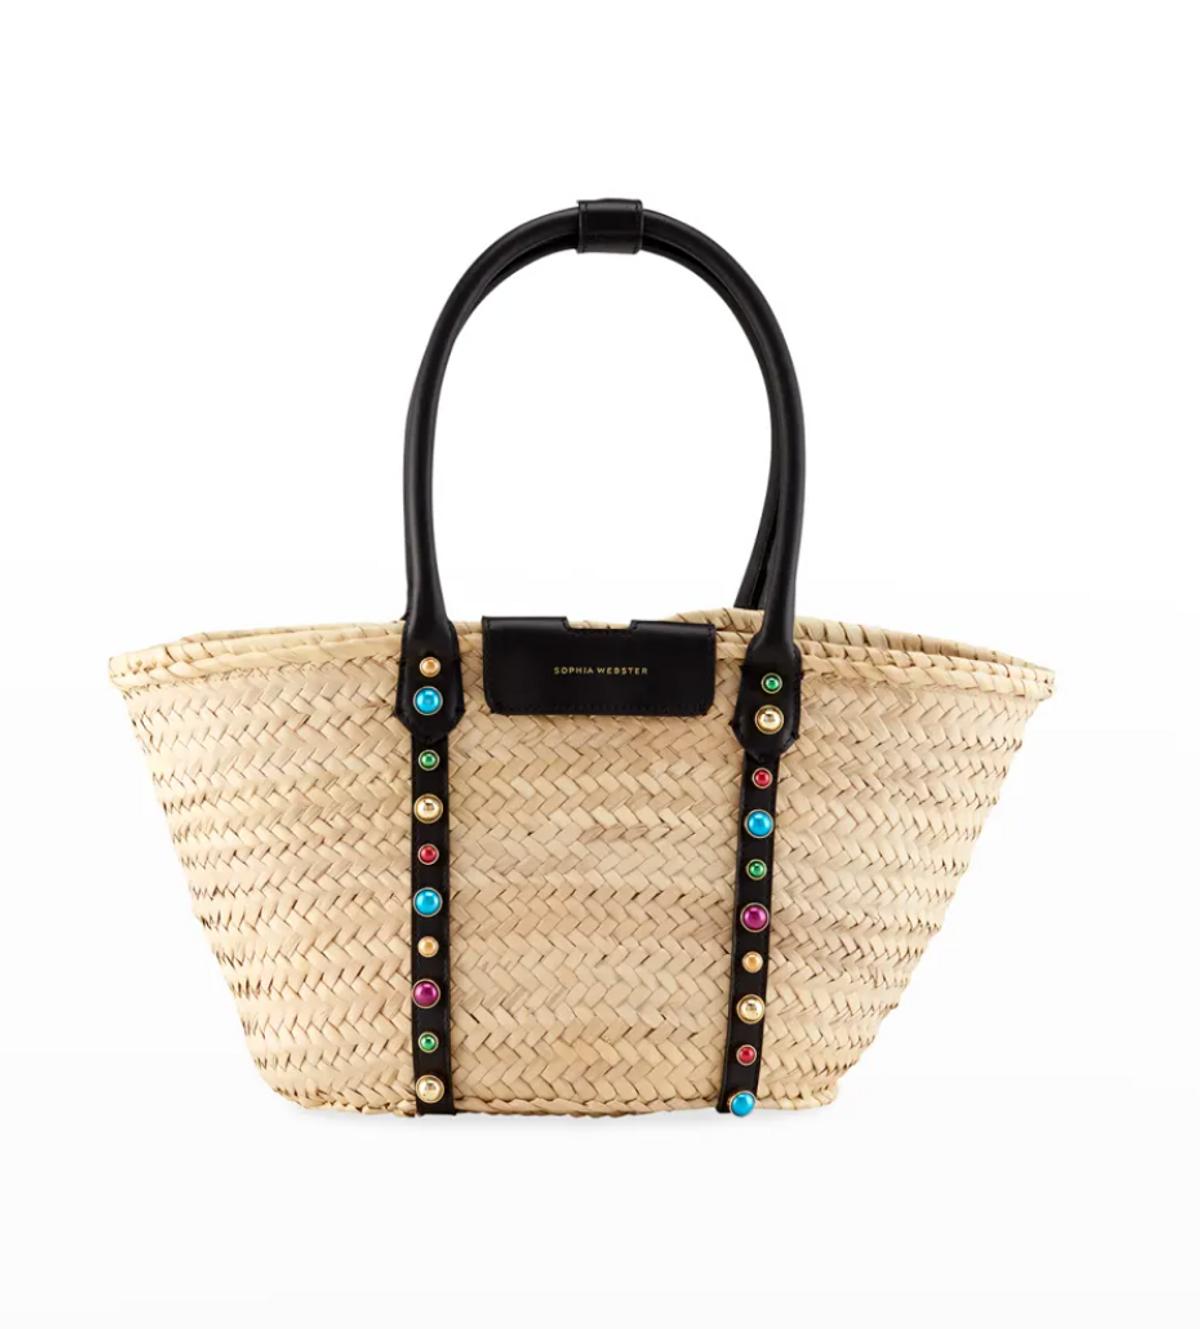 Diana Multicolor Stud Palm Tote Bag